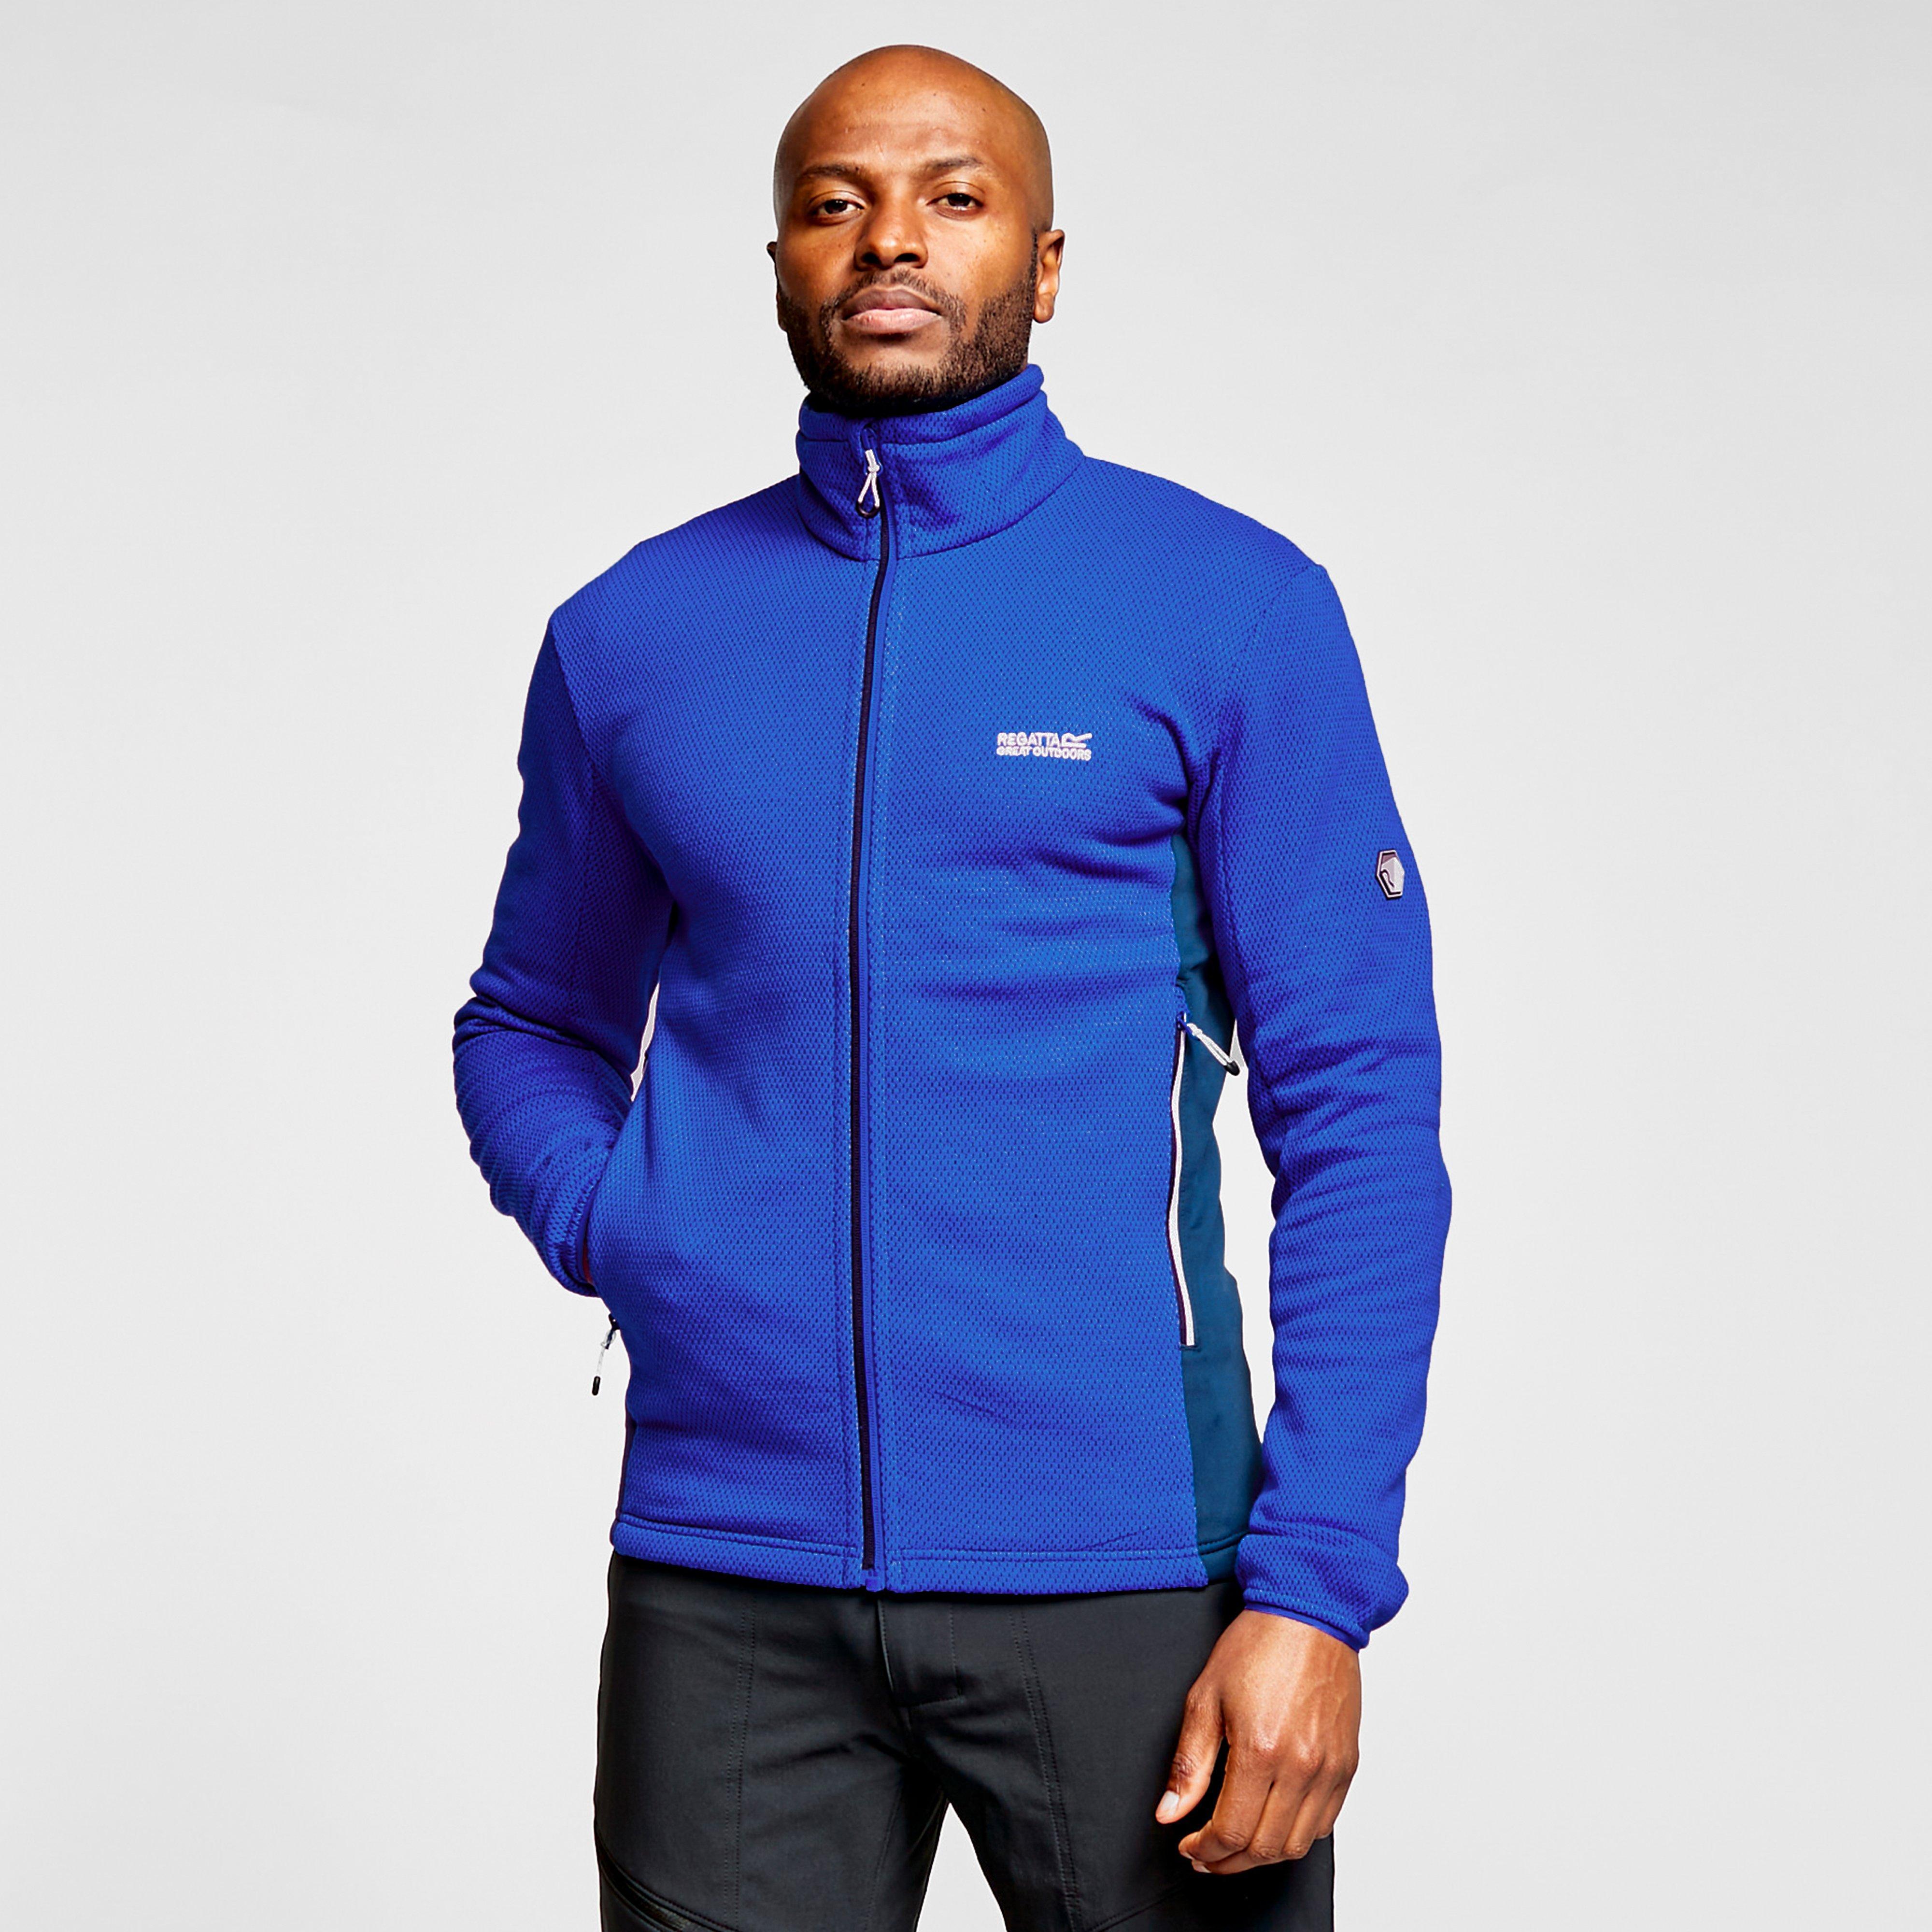 Regatta Men's Highton Fleece Ii - Blue/Blue, Blue